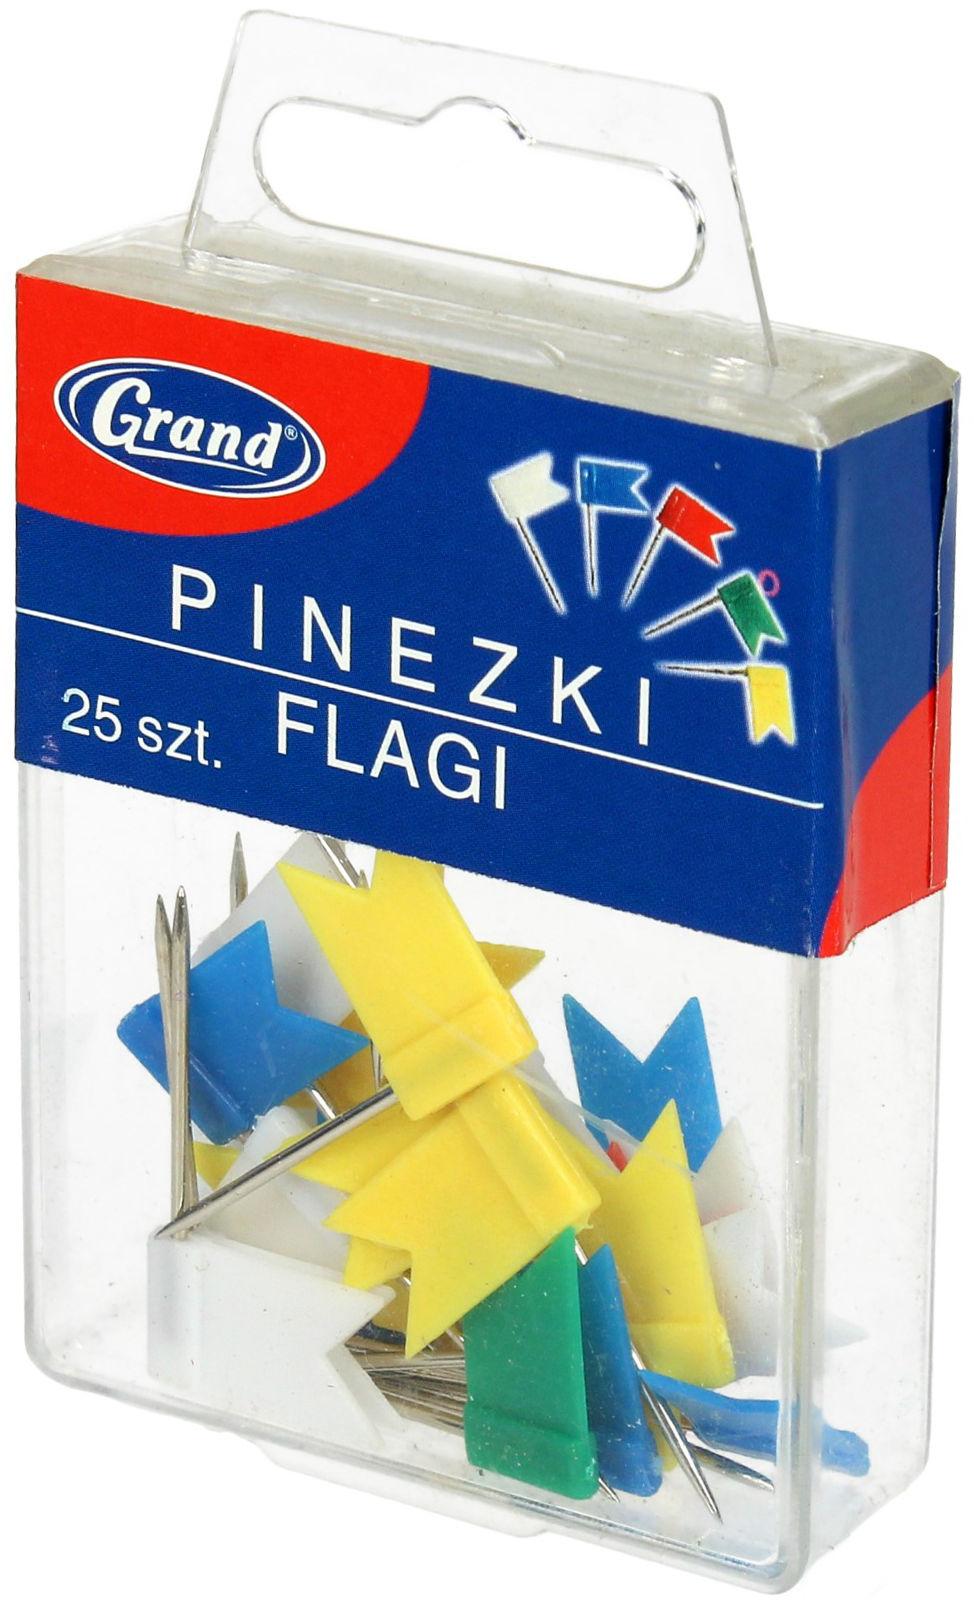 Pinezki flaga 25szt. Grand